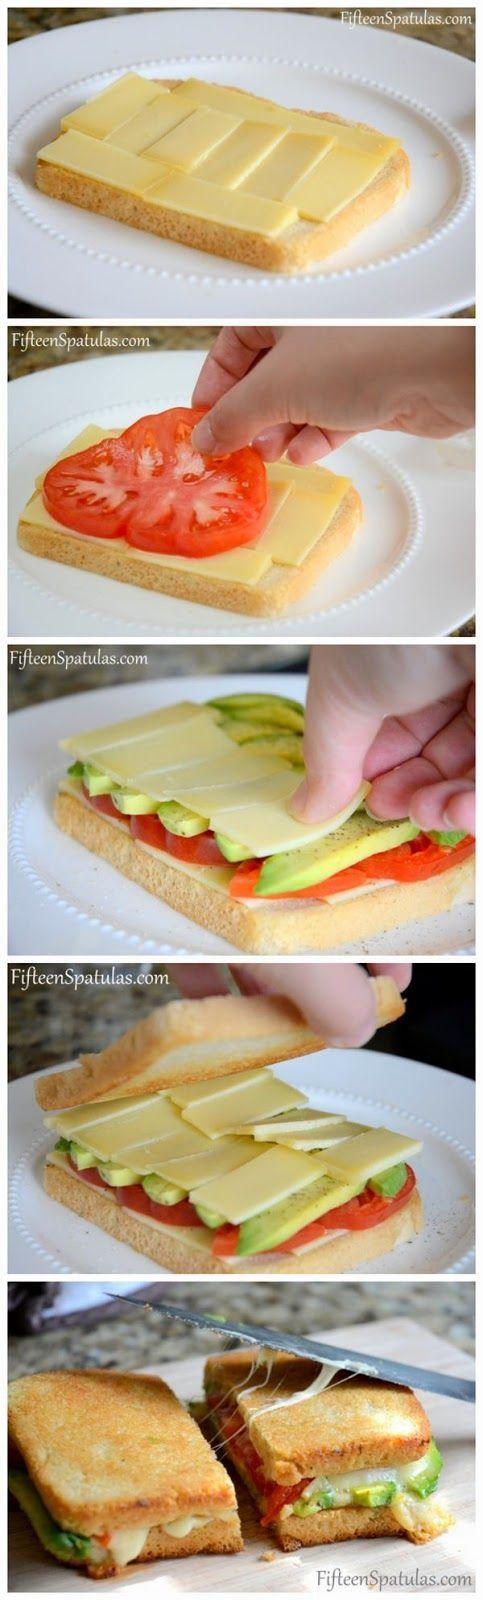 Healthy sandwich:)